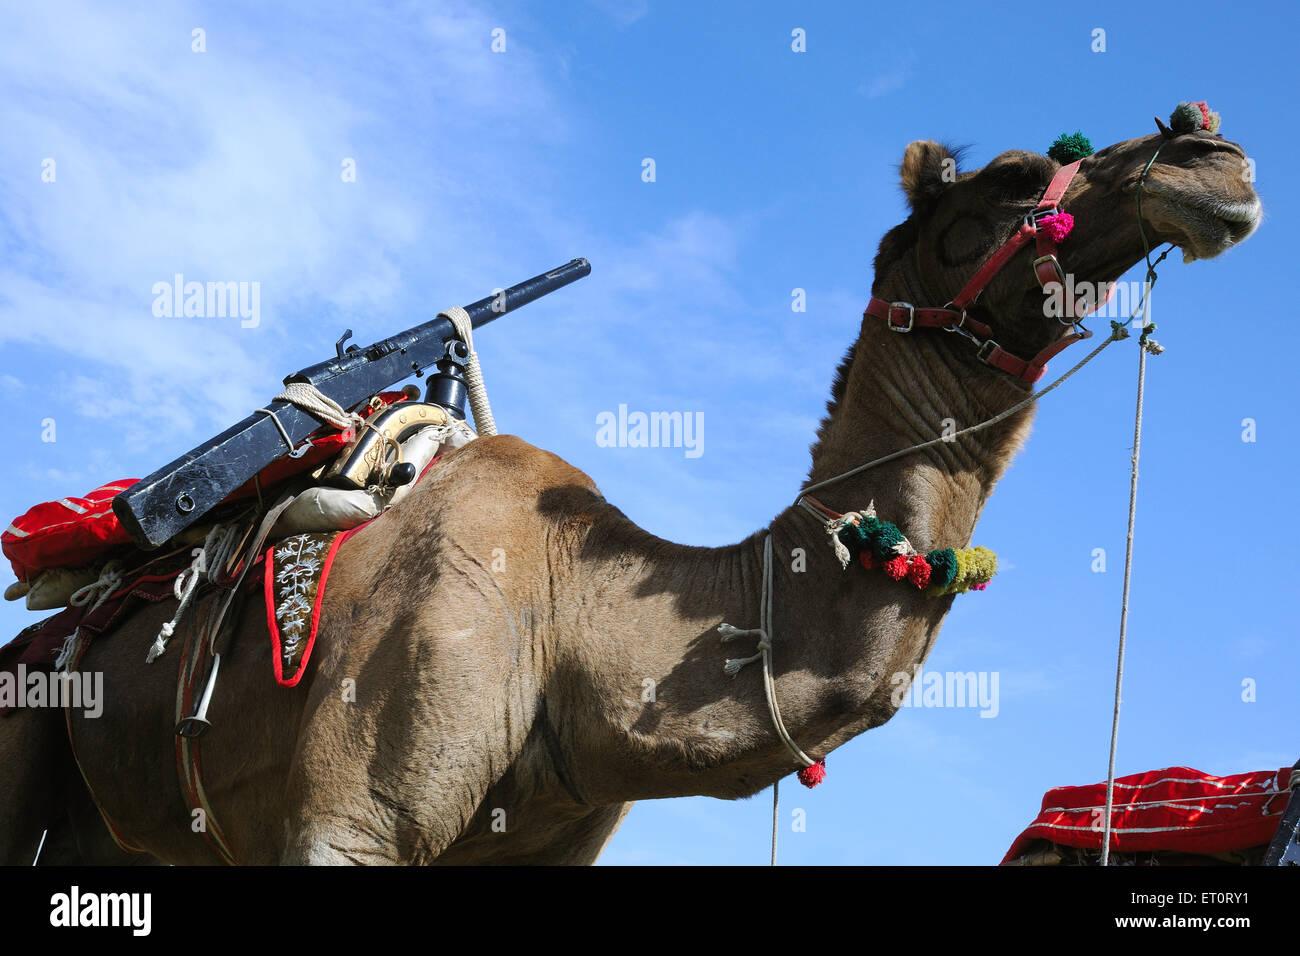 Camel che trasportano armi ; Rajasthan ; India Immagini Stock